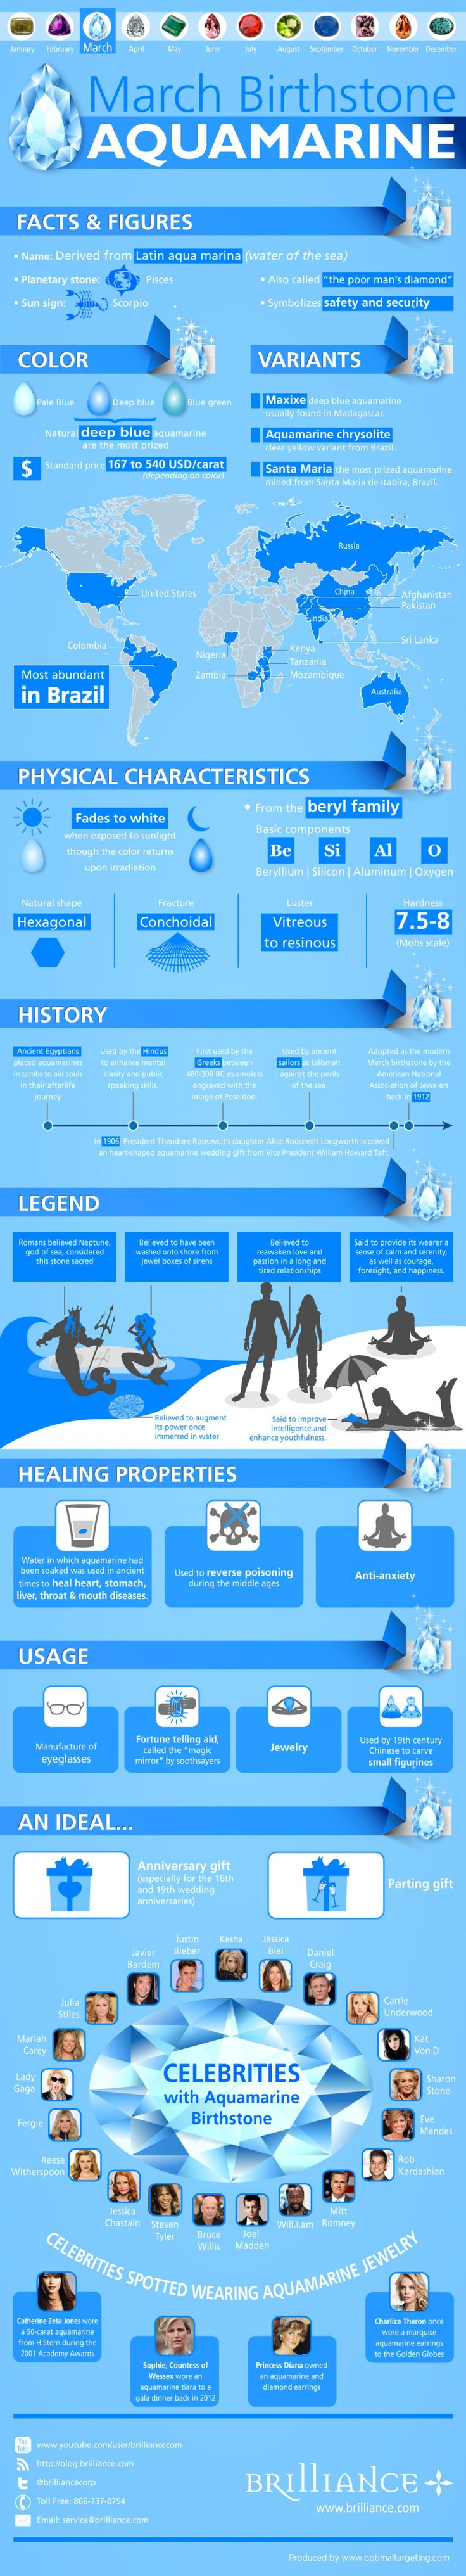 Aquamarine, The Birthstone of March Infographic